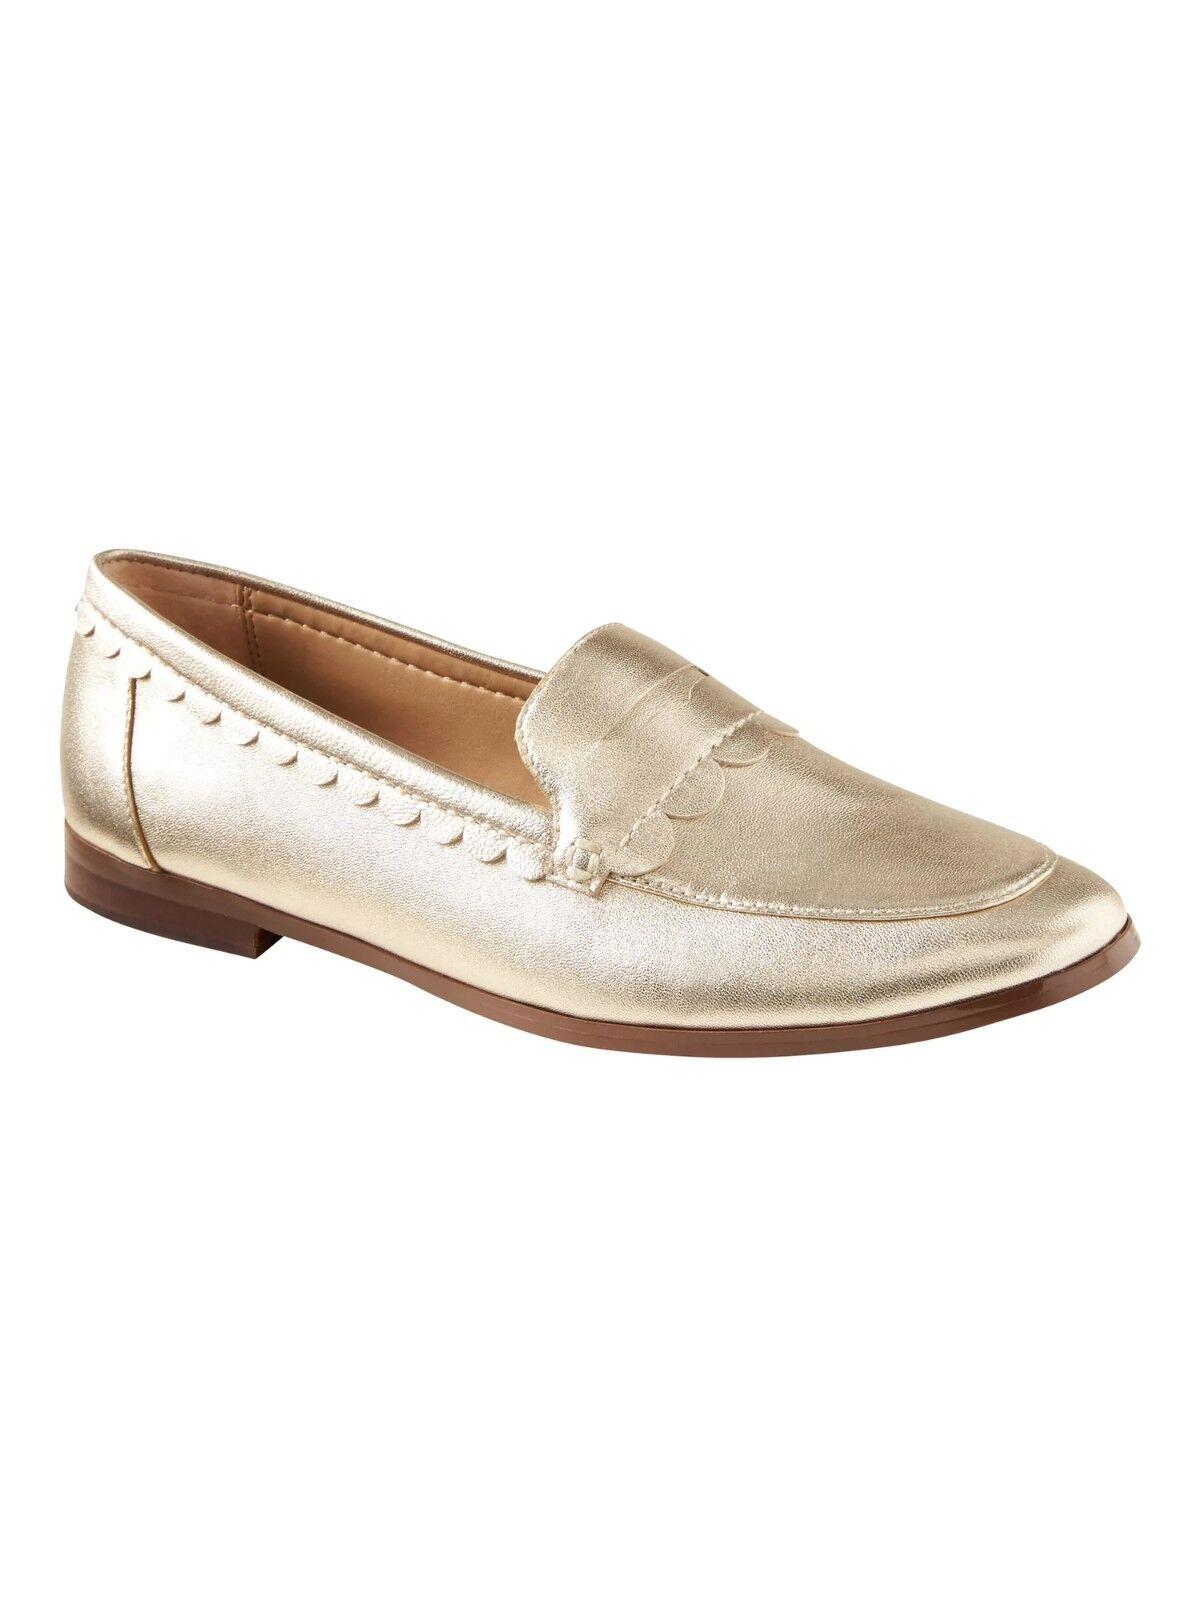 Banana Republic Demi Scallop-Detail Loafer,Navy Patent  SIZE 7.5    #873903 E214